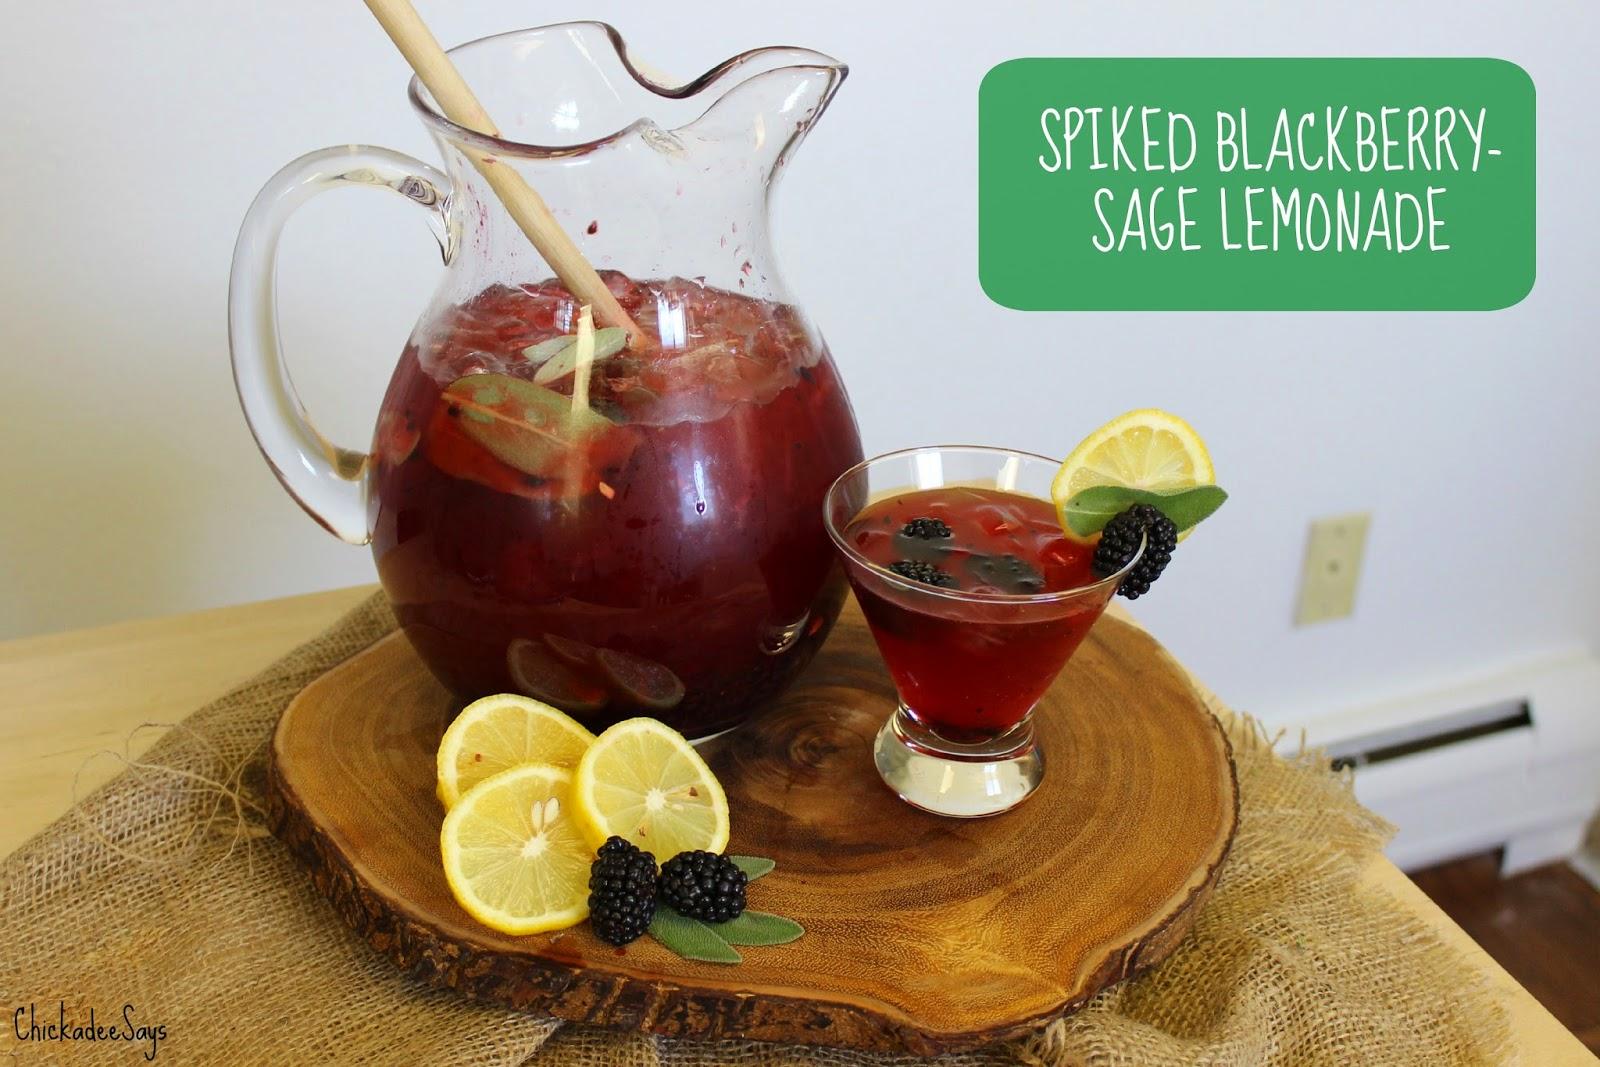 Chickadee Says: Summer Drink Series: Spiked Blackberry-Sage Lemonade